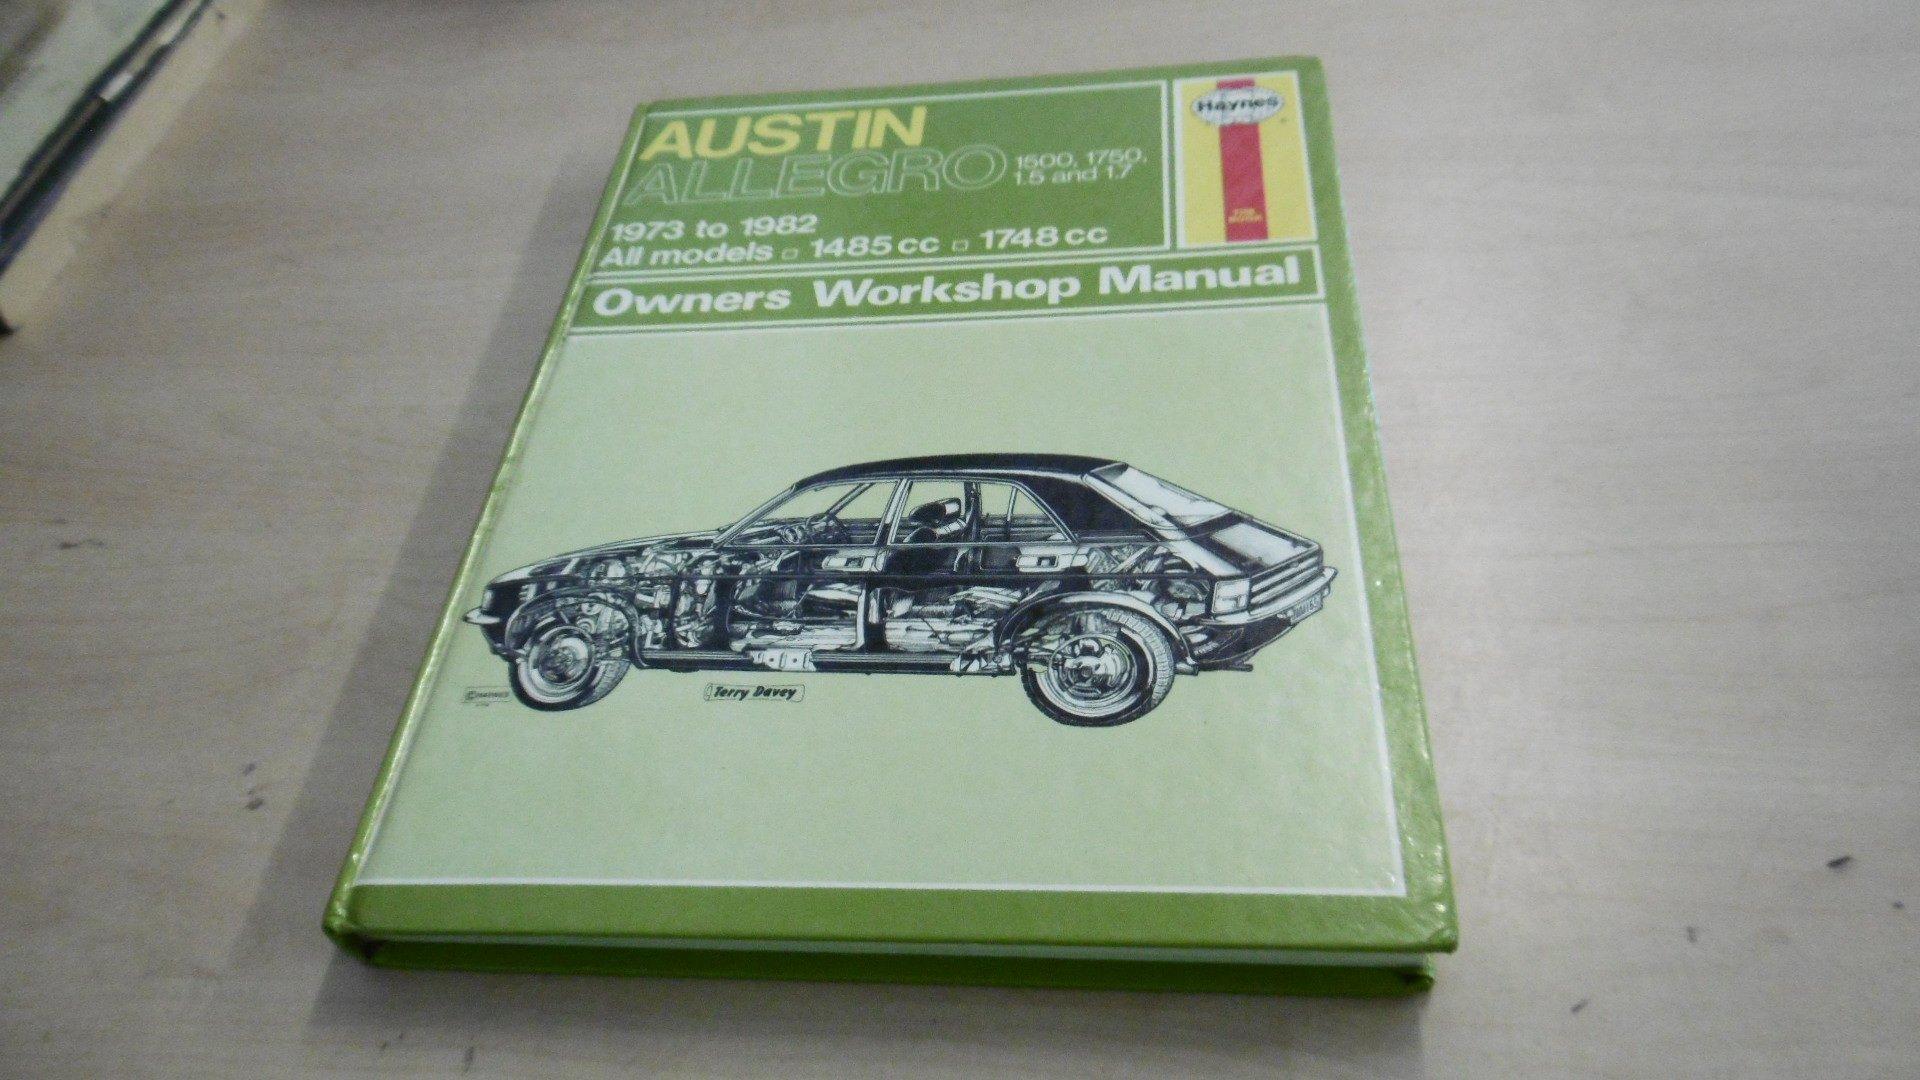 Austin Allegro 1500/1750 1973-82 Owner's Workshop Manual: J. H. Haynes,  B.L.Chalmers- Hunt: 9780856969423: Amazon.com: Books